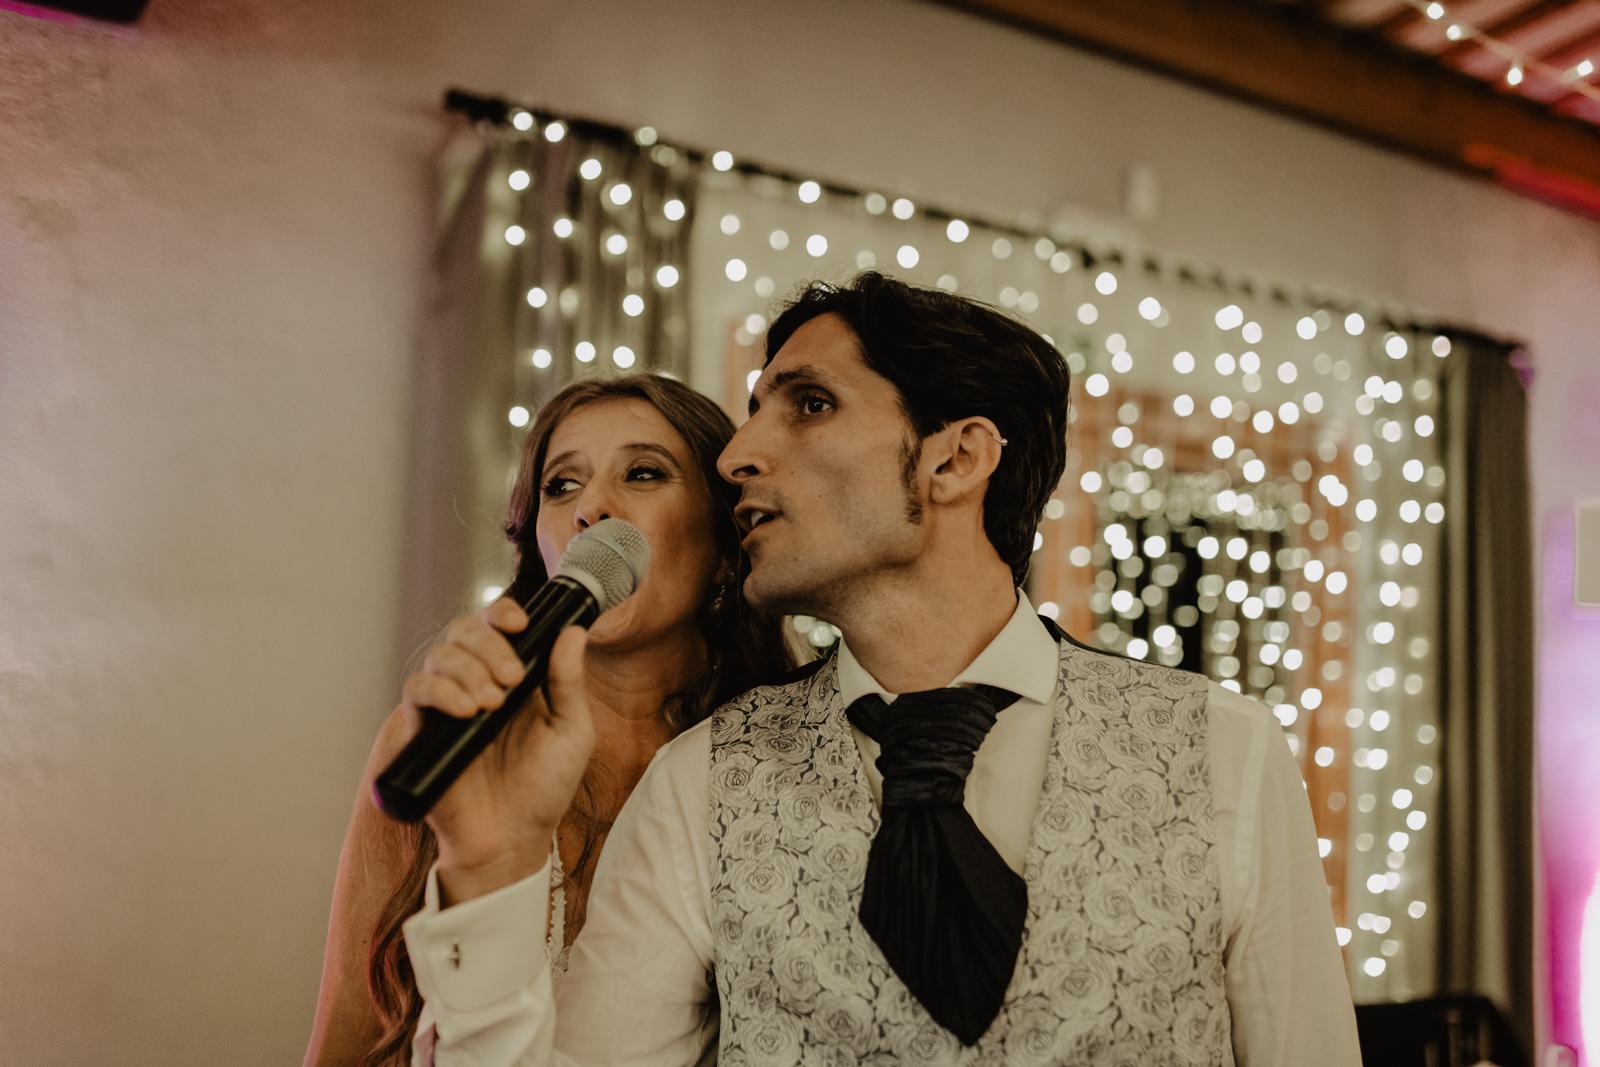 thenortherngirlphotography_photography_thenortherngirl_rebeccascabros_wedding_weddingphotography_weddingphotographer_barcelona_bodaenbarcelona_bodaenmaselmarti_bodarogeryvane-920.jpg